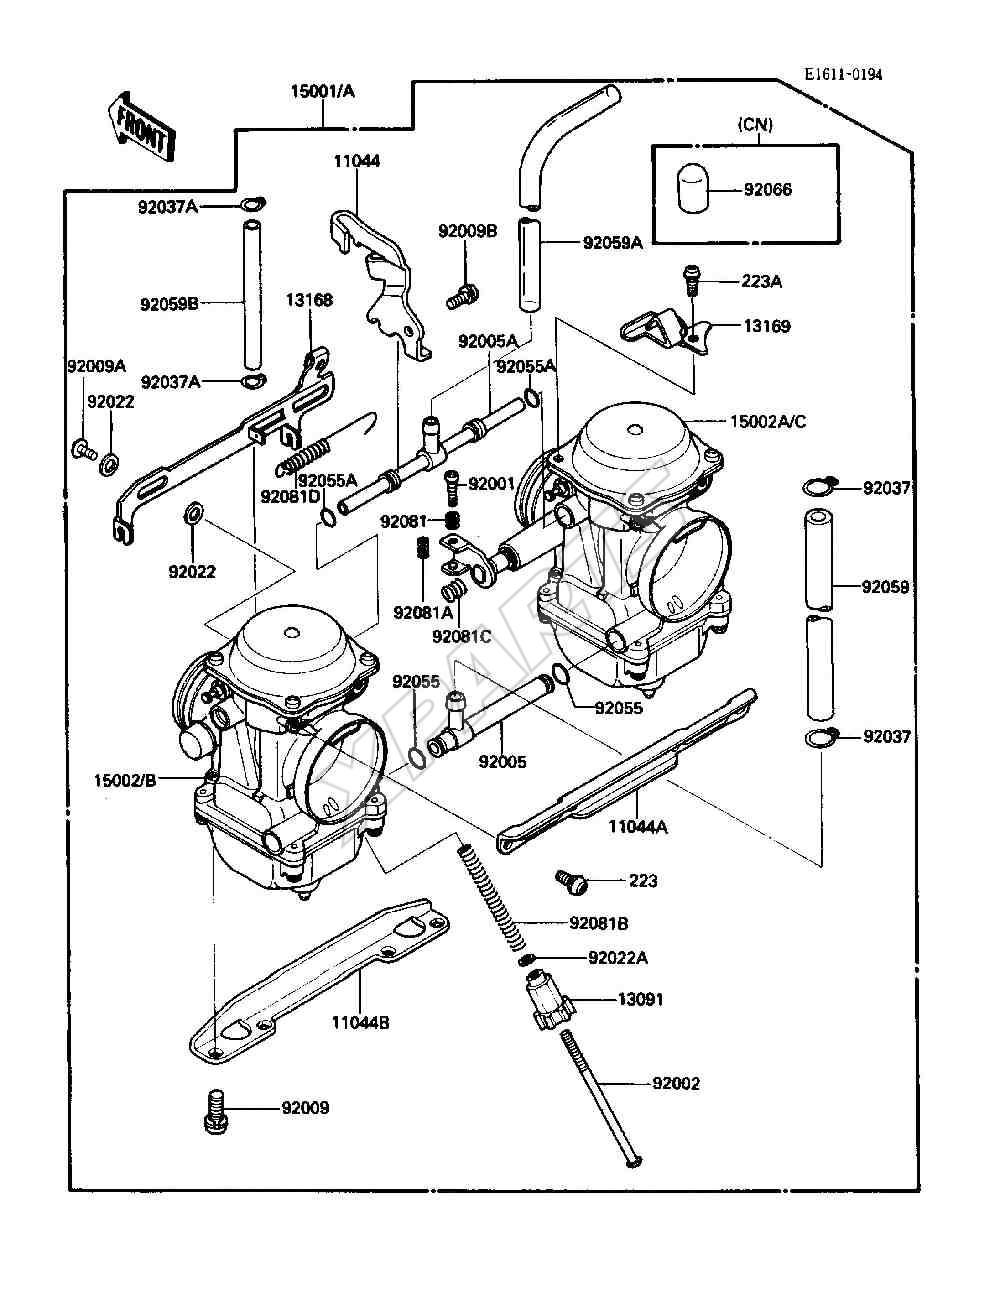 medium resolution of kawasaki 454 ltd en450 a4 fra 1988 originale reservedele fra 1987 454 kawasaki engine diagram